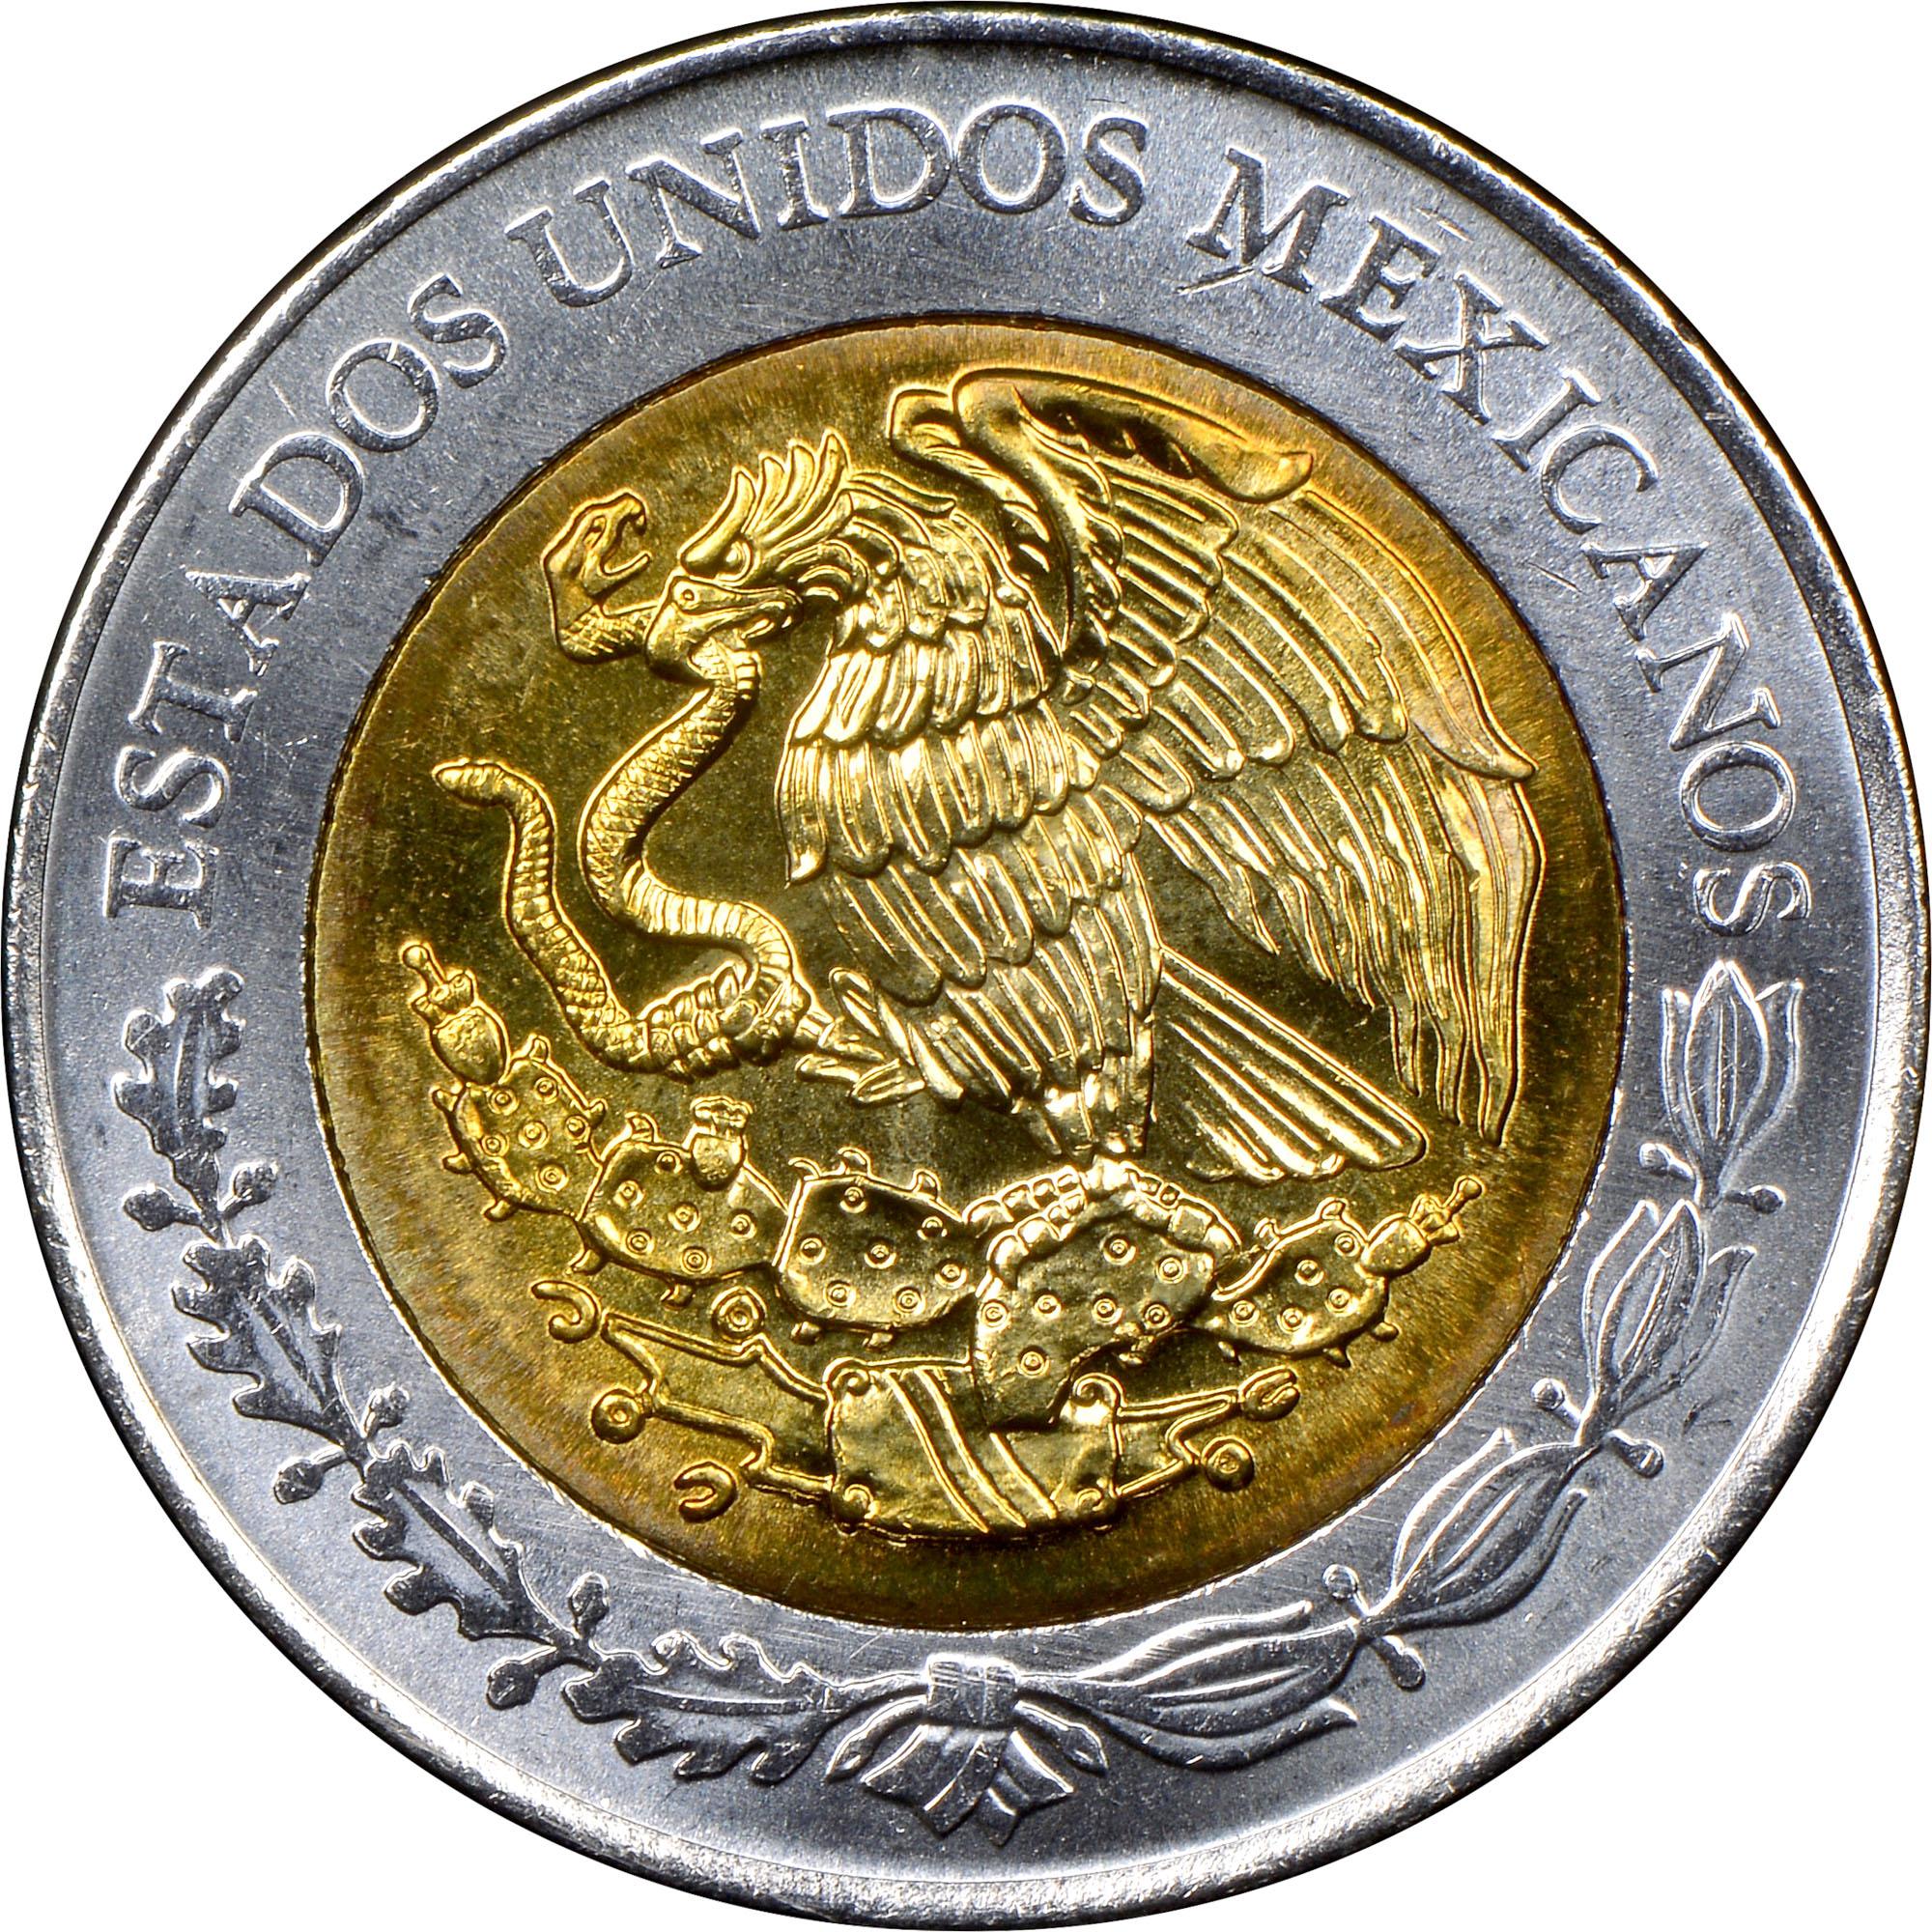 mexico estados unidos mexicanos 5 pesos km 923 prices values ngc. Black Bedroom Furniture Sets. Home Design Ideas